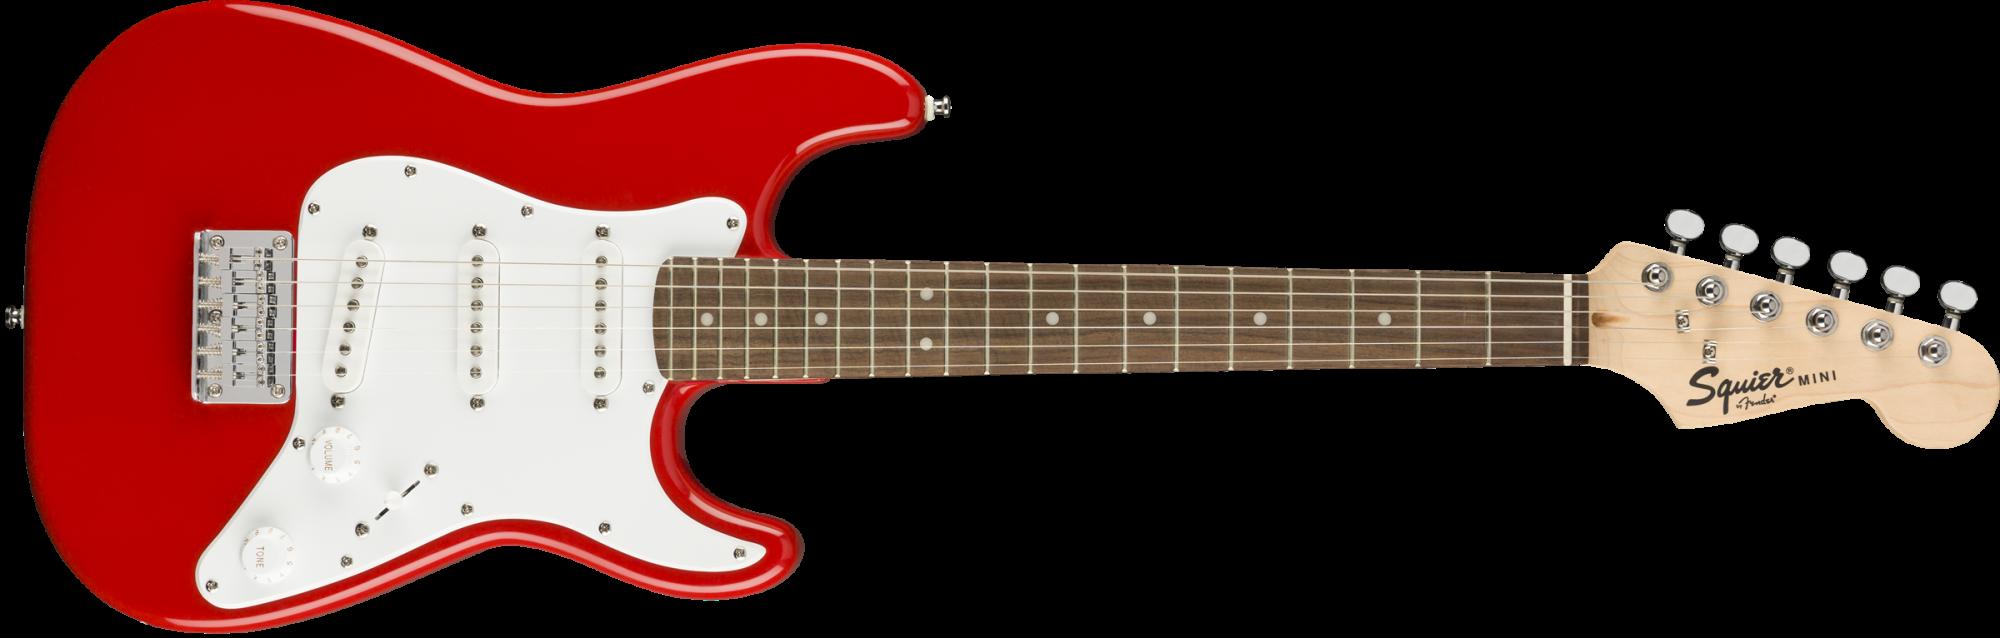 Squier Mini Strat Electric Guitar - Torino Red